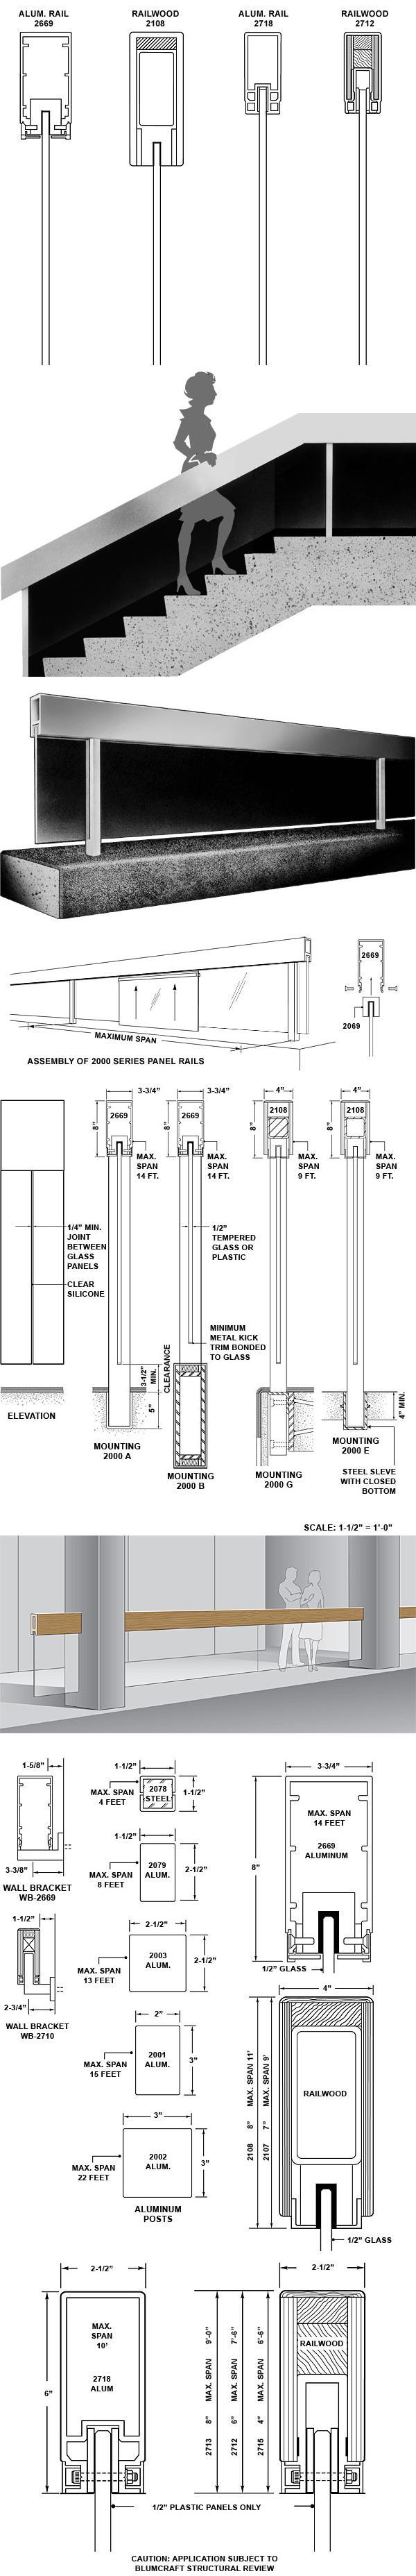 Suspended Panel Rail Series 2000